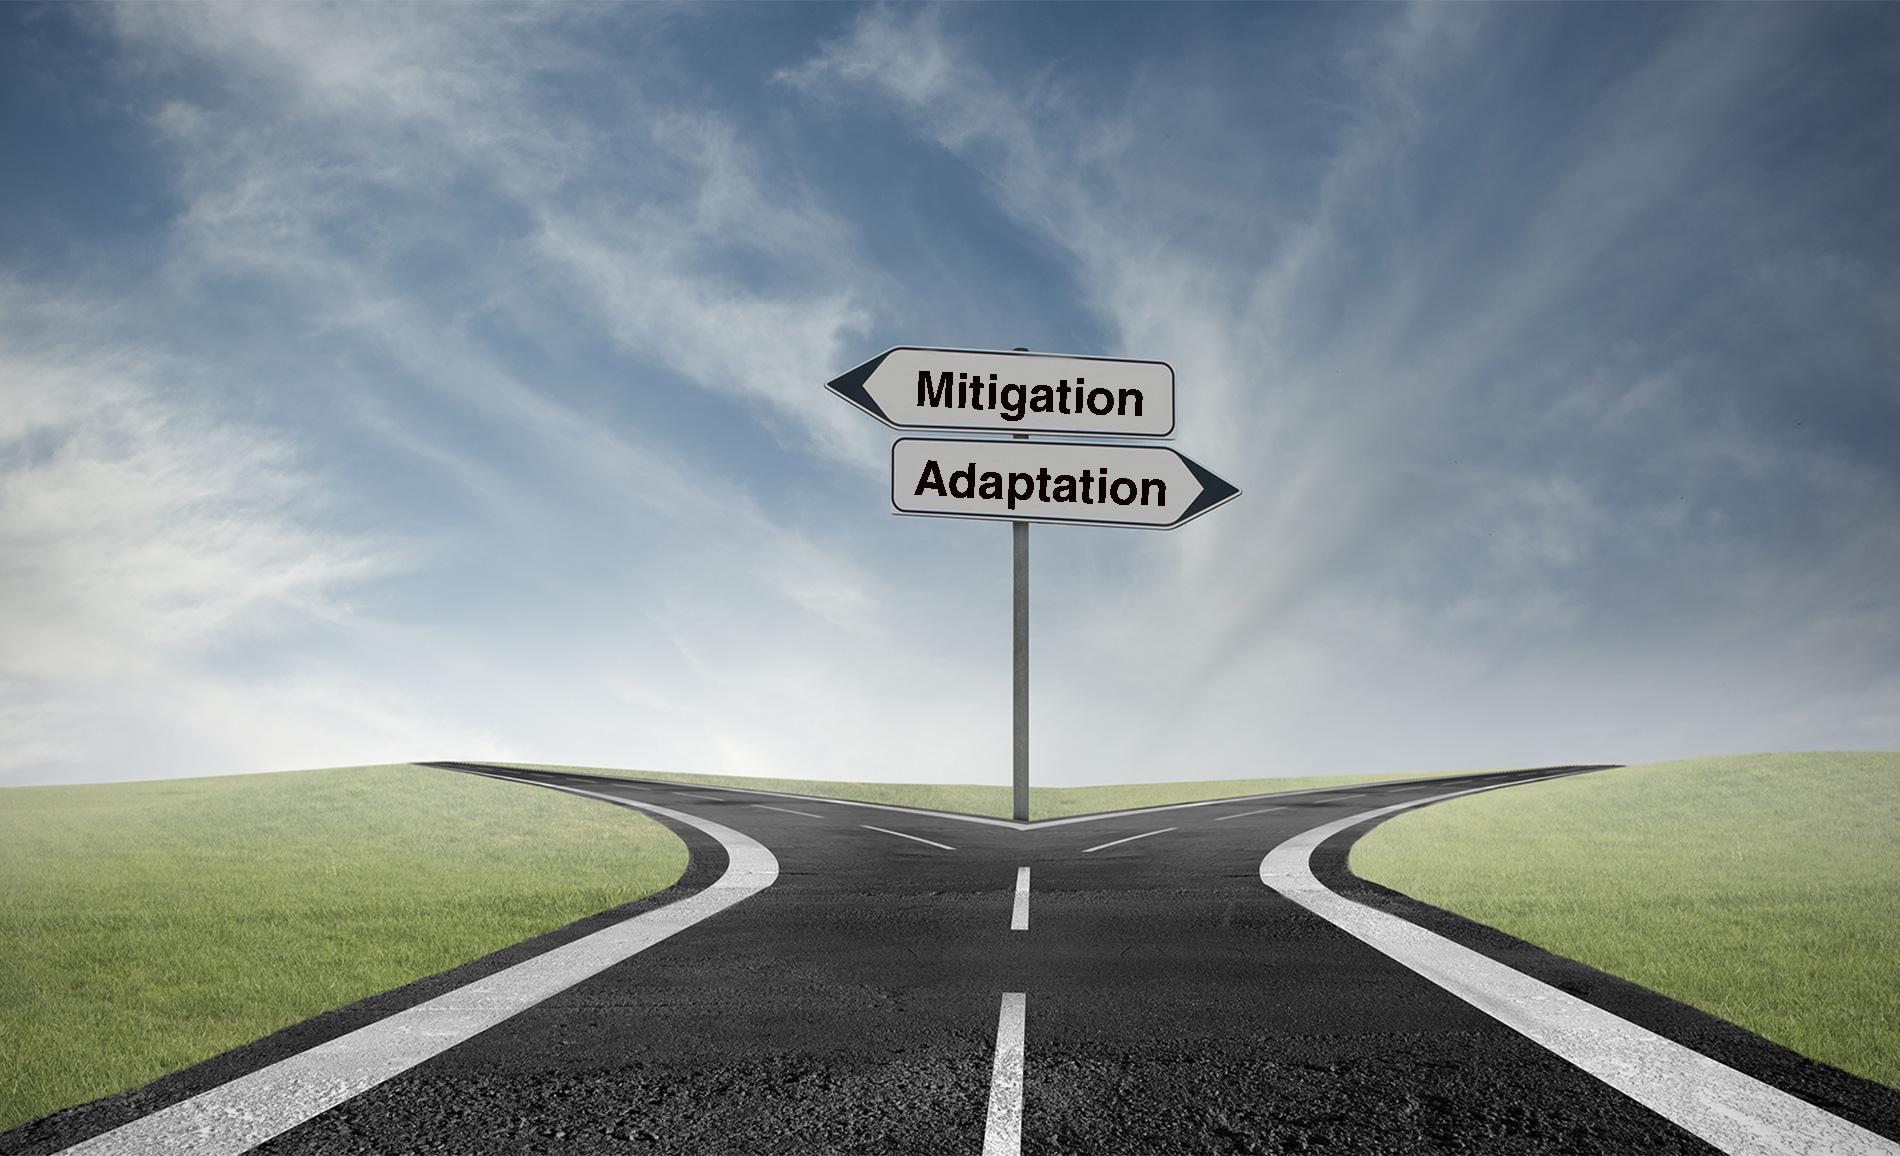 Mitigation-Adaptation Crossroads